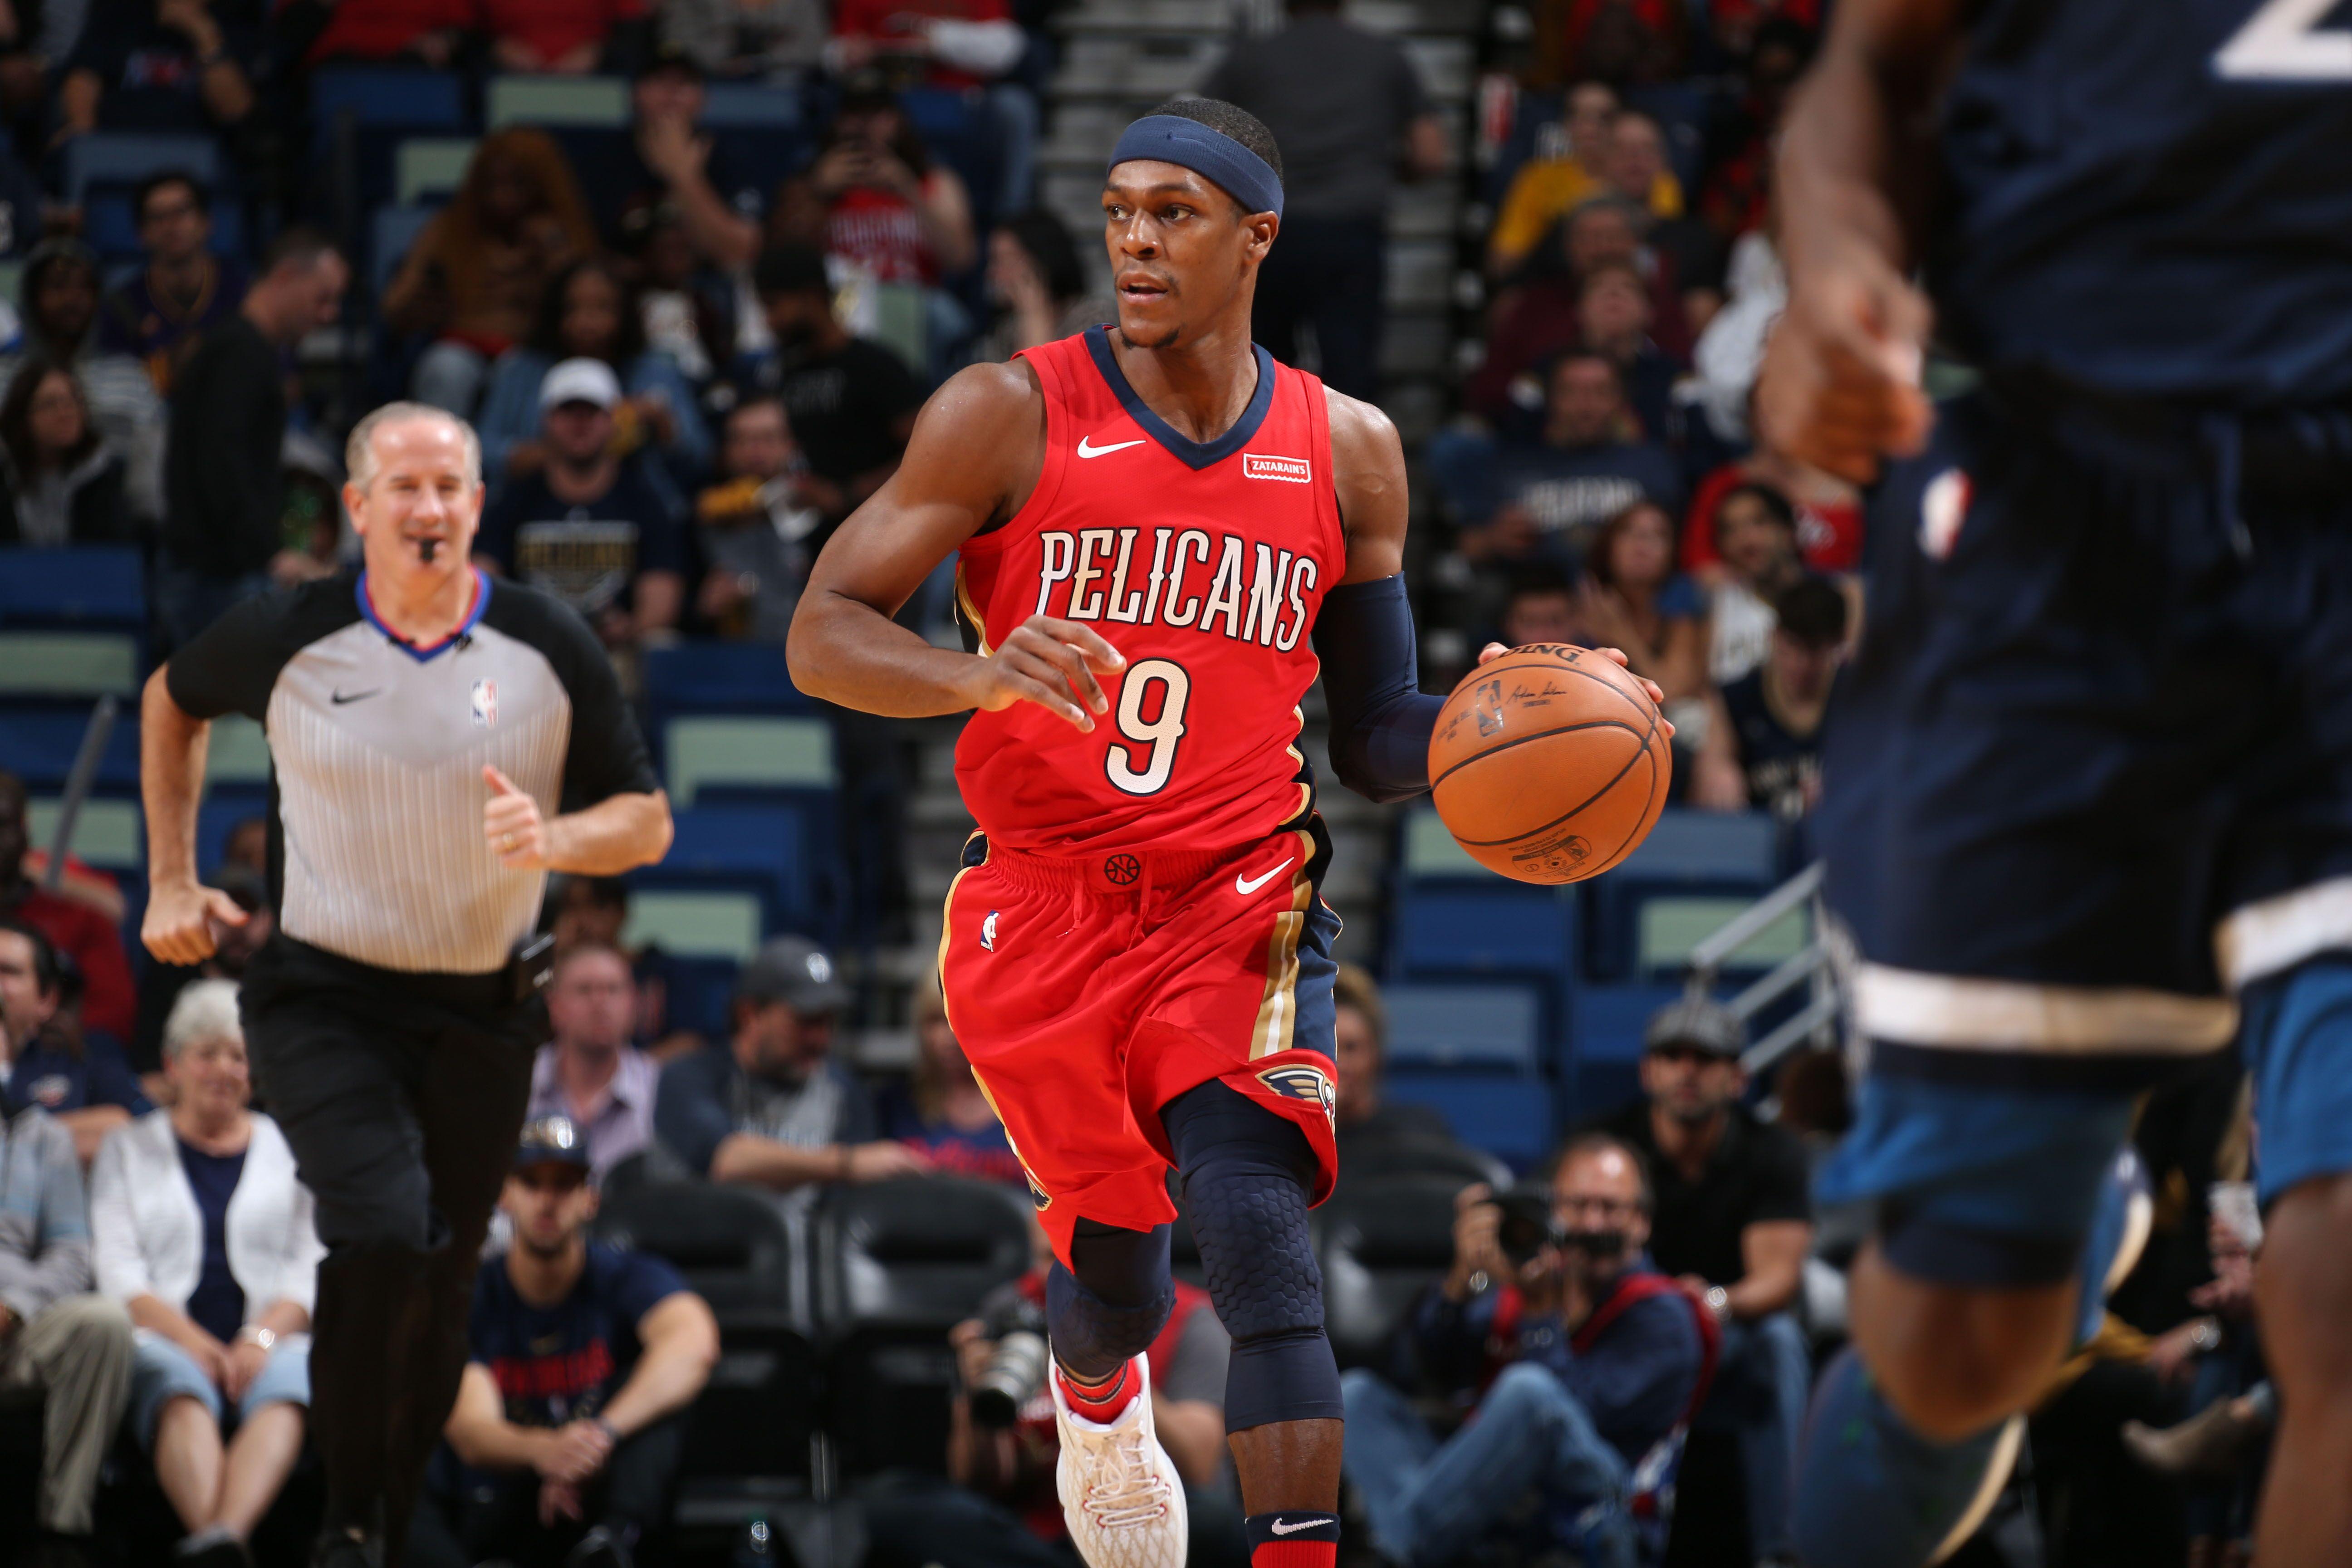 b095e7925d1 New Orleans Pelicans  Should Rajon Rondo still be the starter